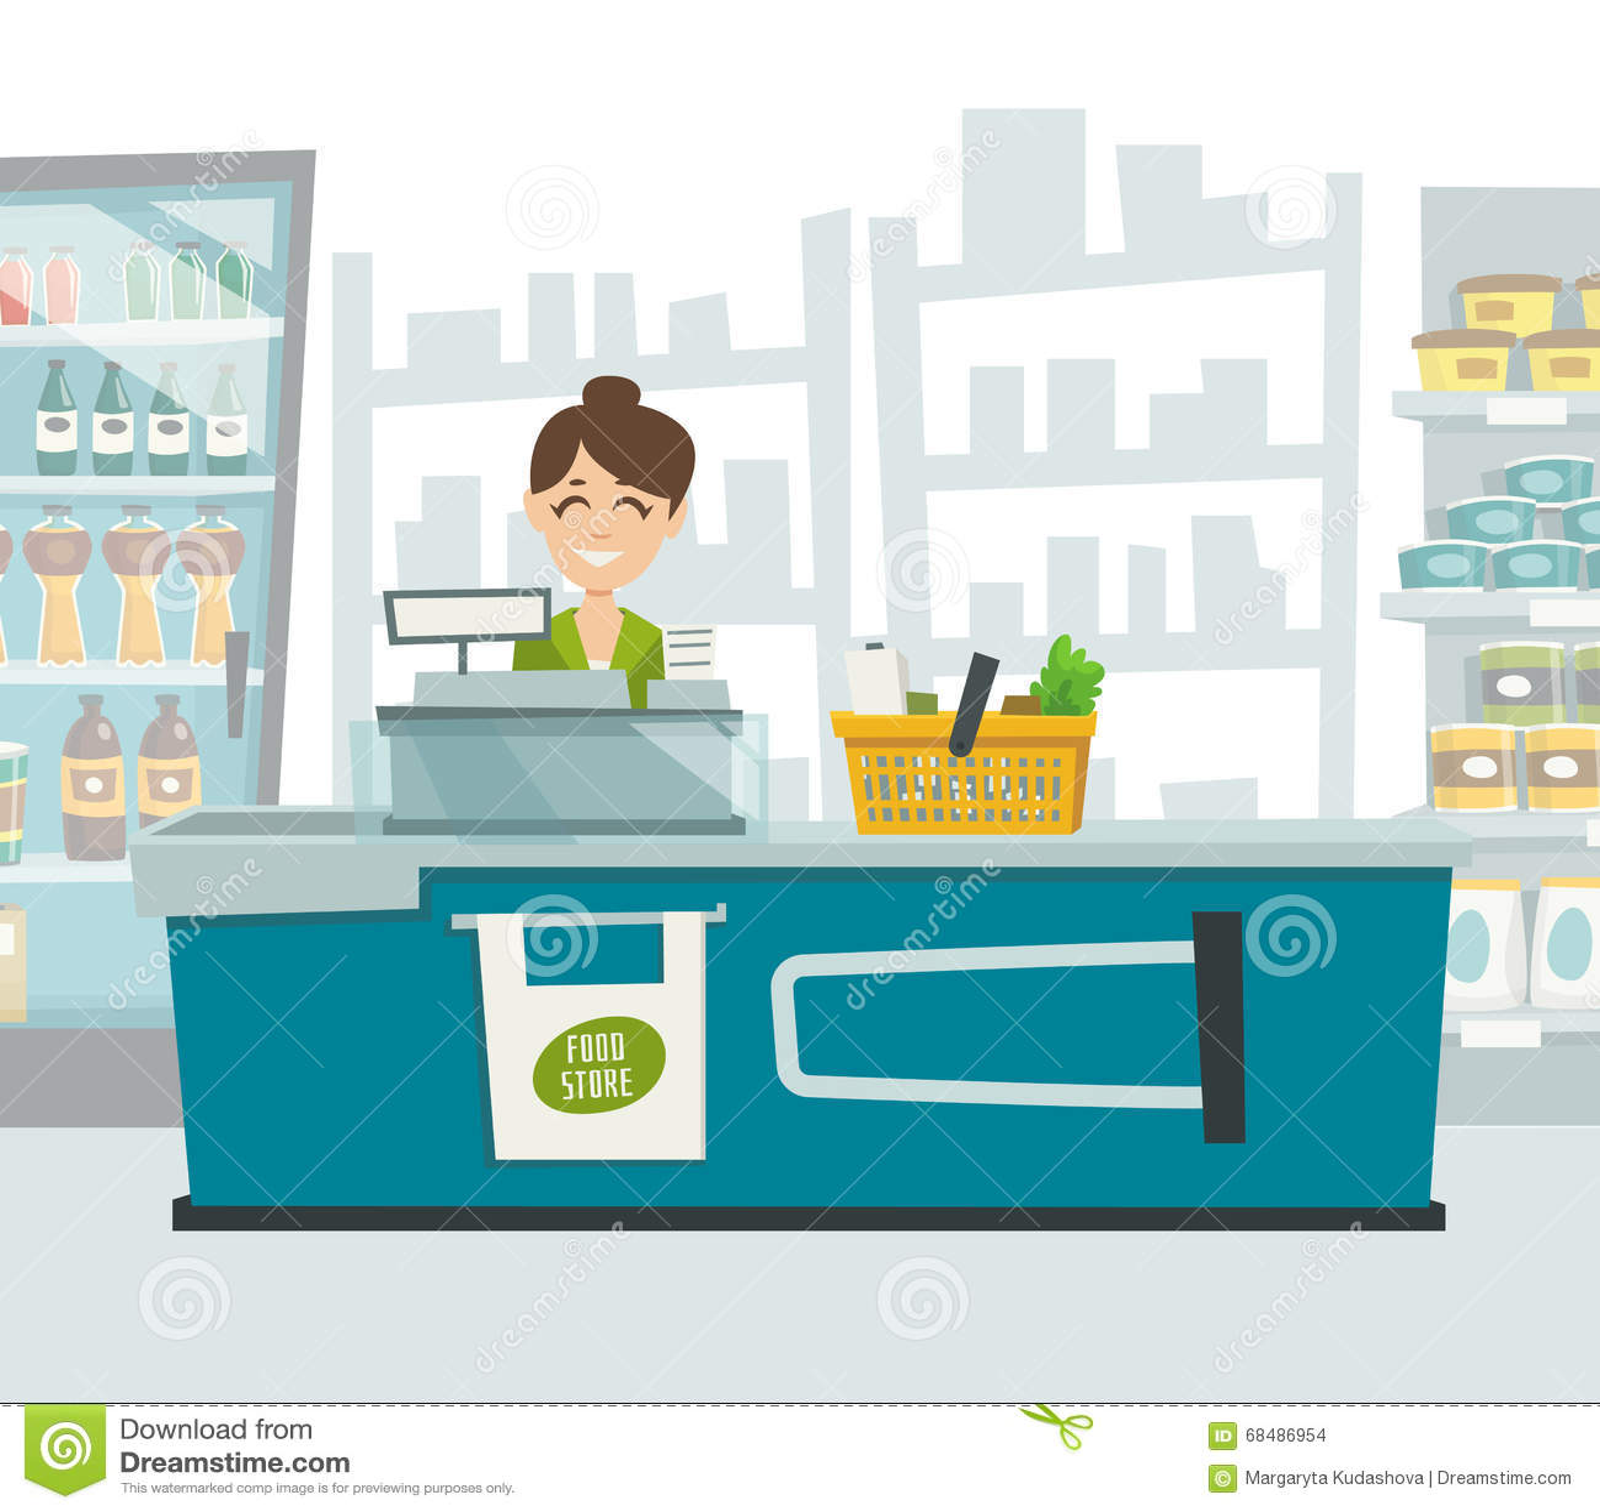 Supermarket Cashier Within Shop Interior Vector Cartoon Illustration Stock Vector